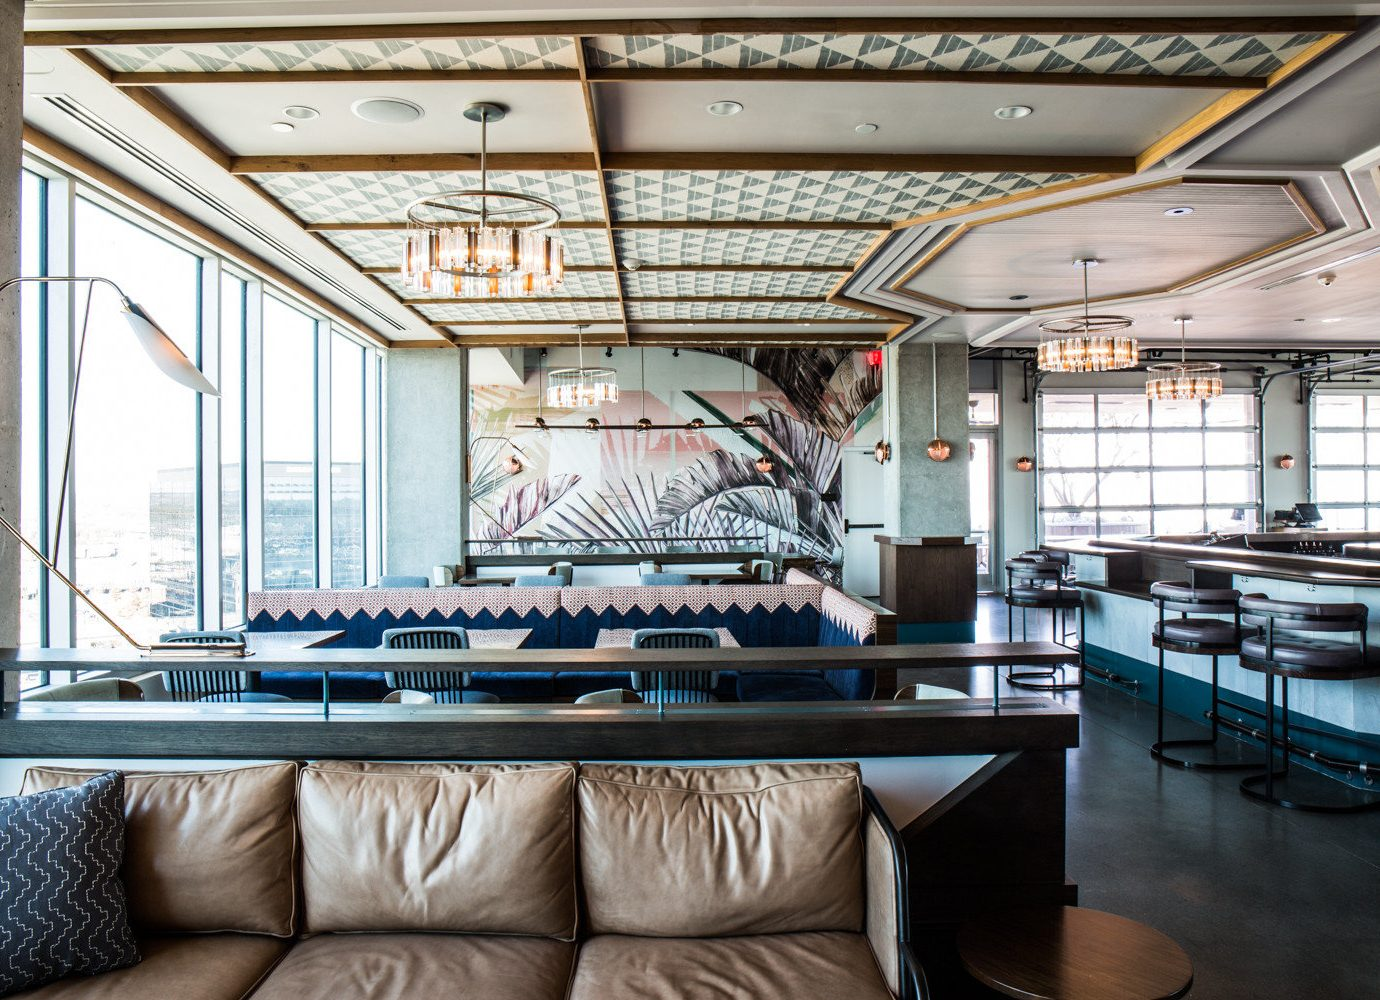 Hotels indoor floor room ceiling living room interior design home estate Design window covering yacht